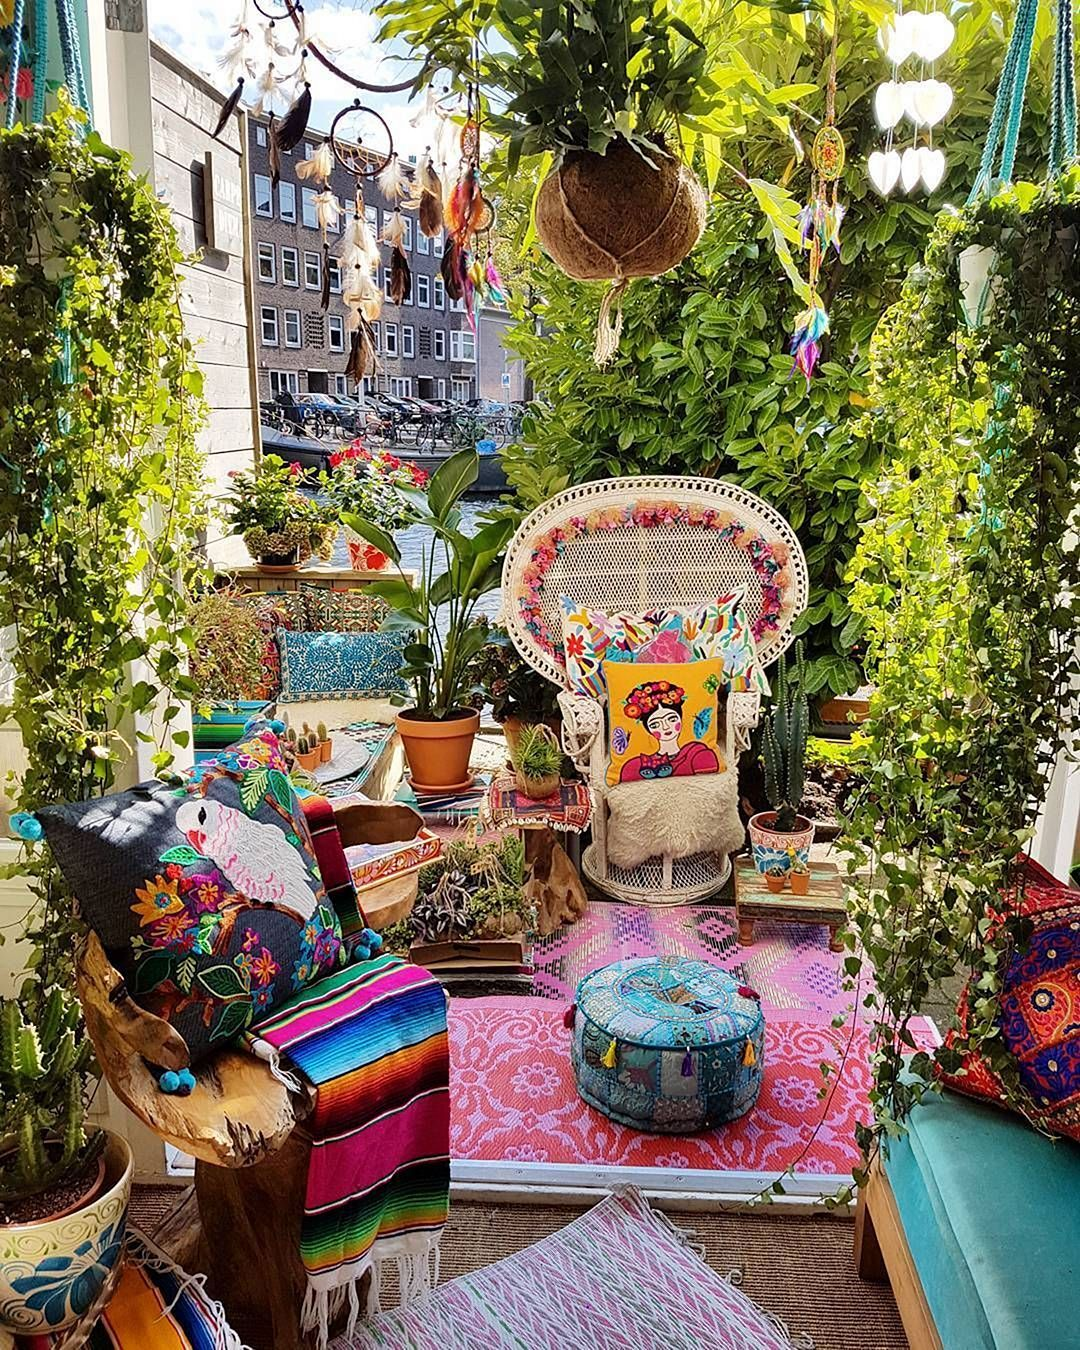 57 Amazing Beautiful Garden Ideas Inspiration And: 24 Beautiful Hippie Garden Design For Fun Garden